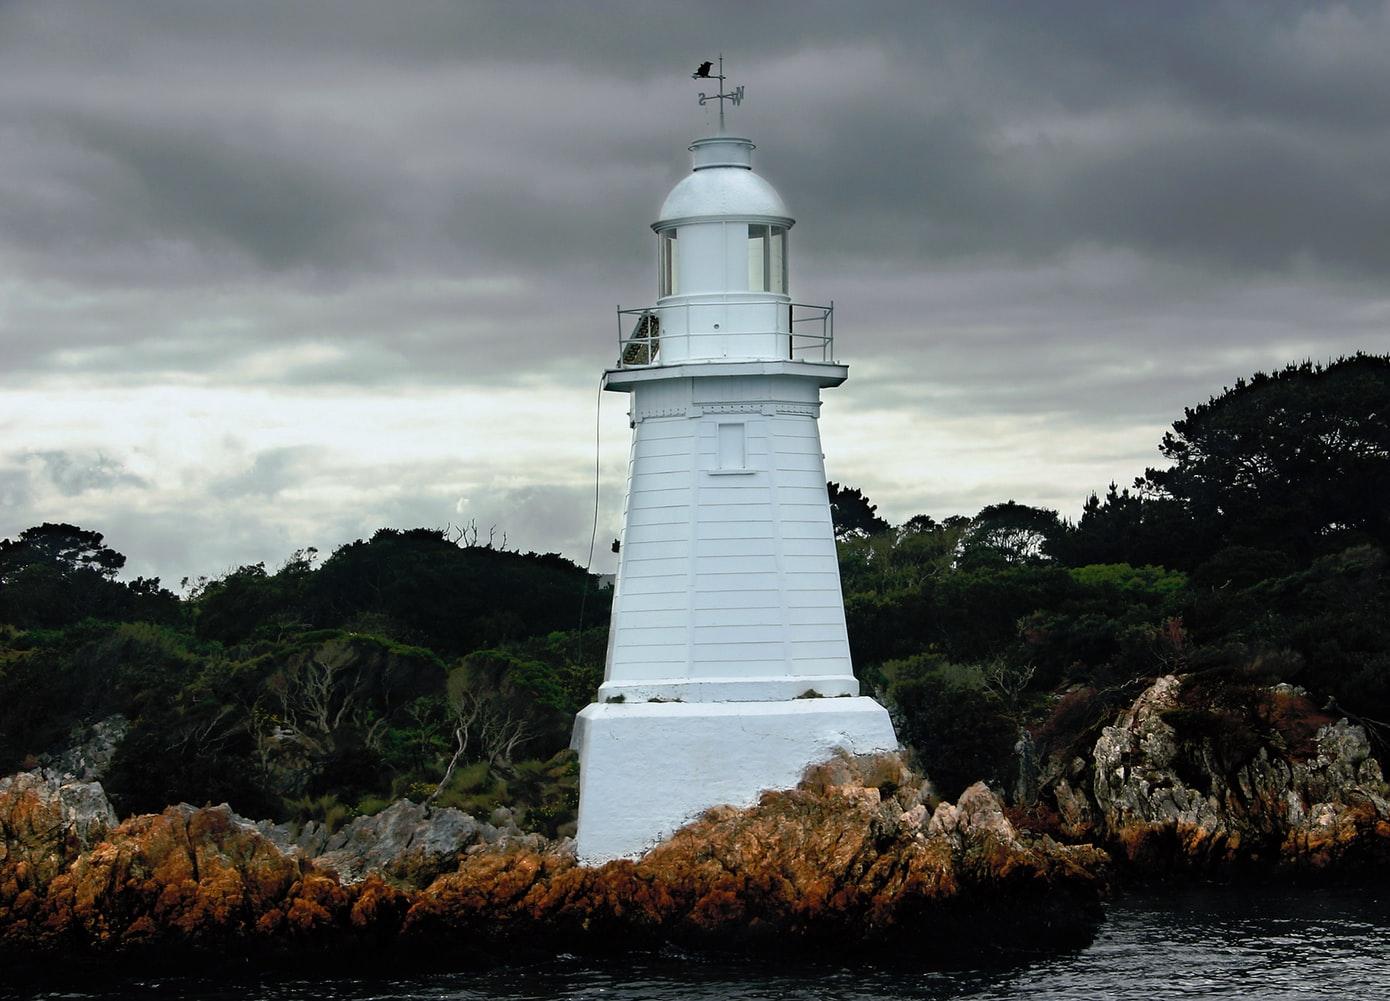 Nopeus dating Tasmania